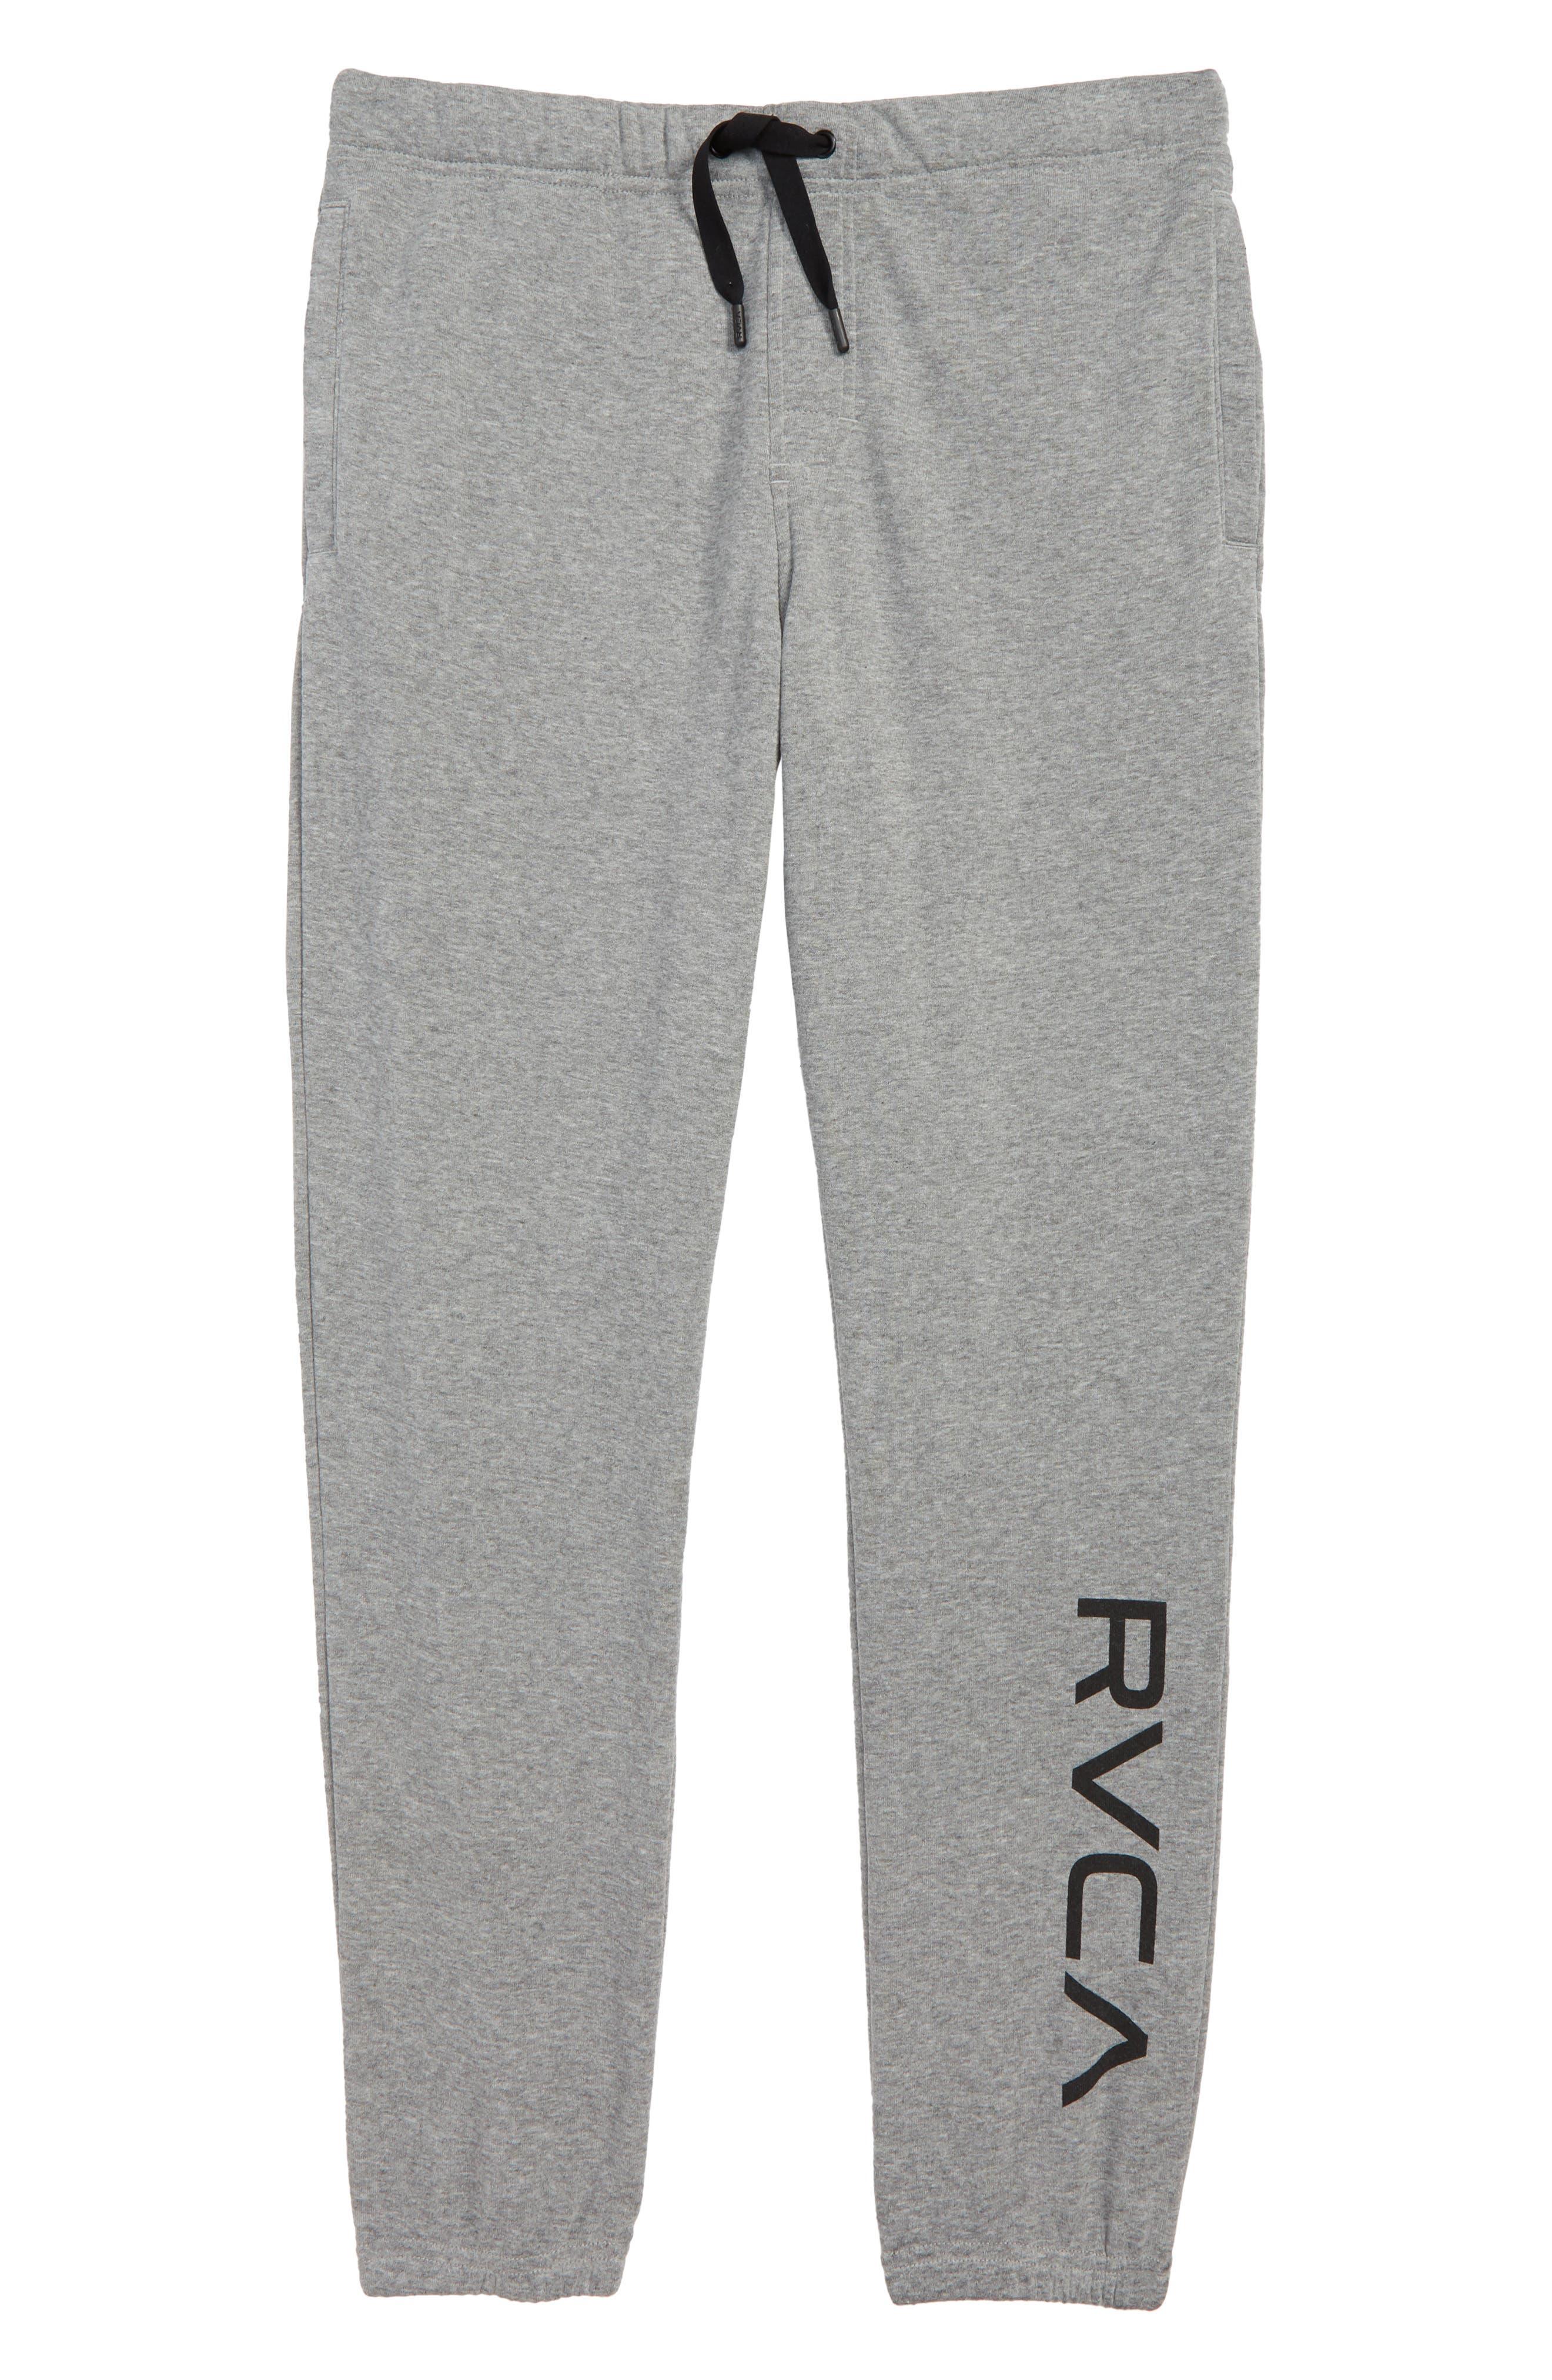 Boys Rvca Fleece Sweatpants Size L (1416)  Grey